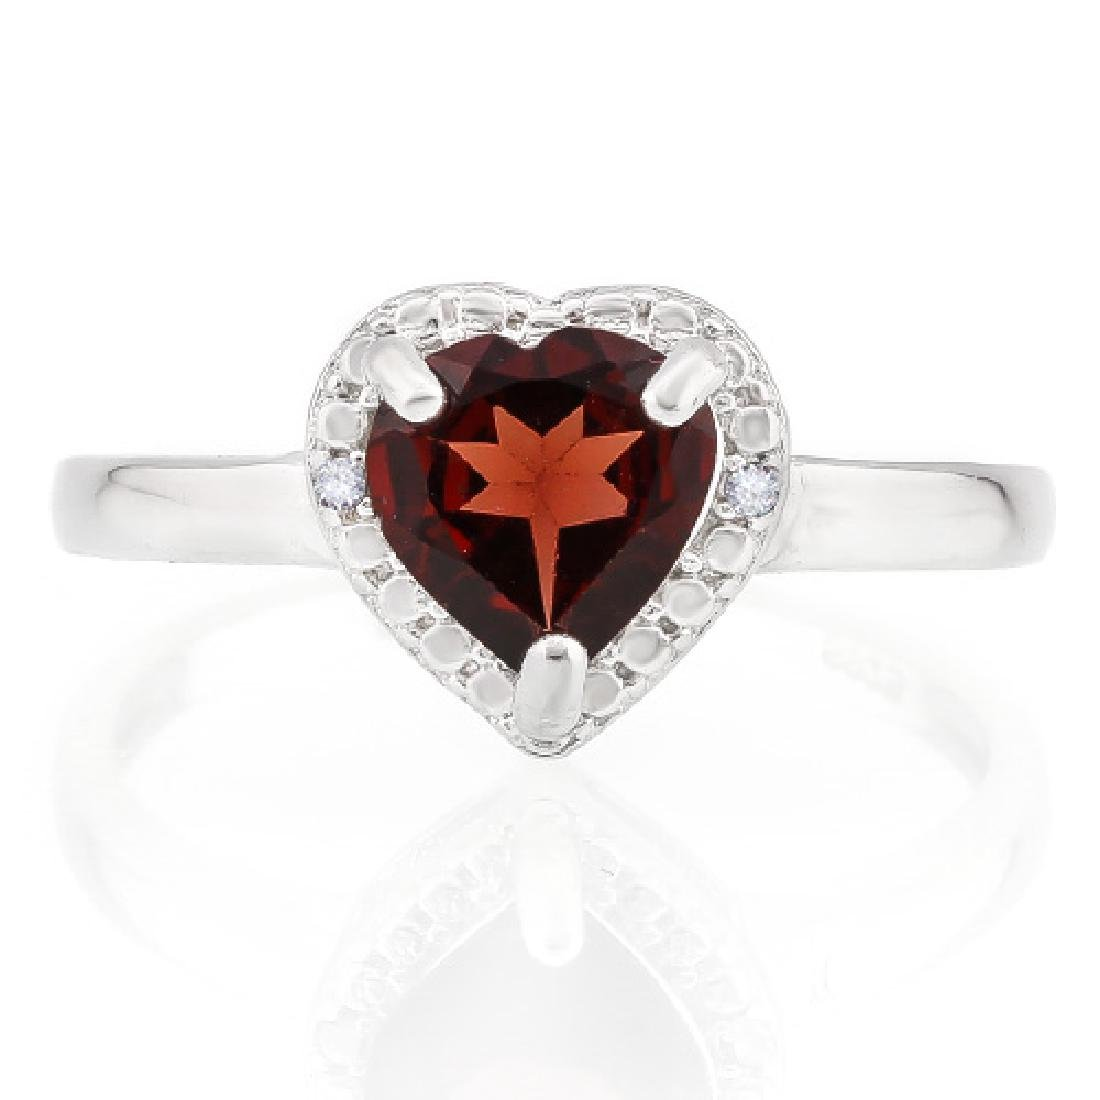 1 1/4 CARAT GARNET & DIAMOND 925 STERLING SILVER RING